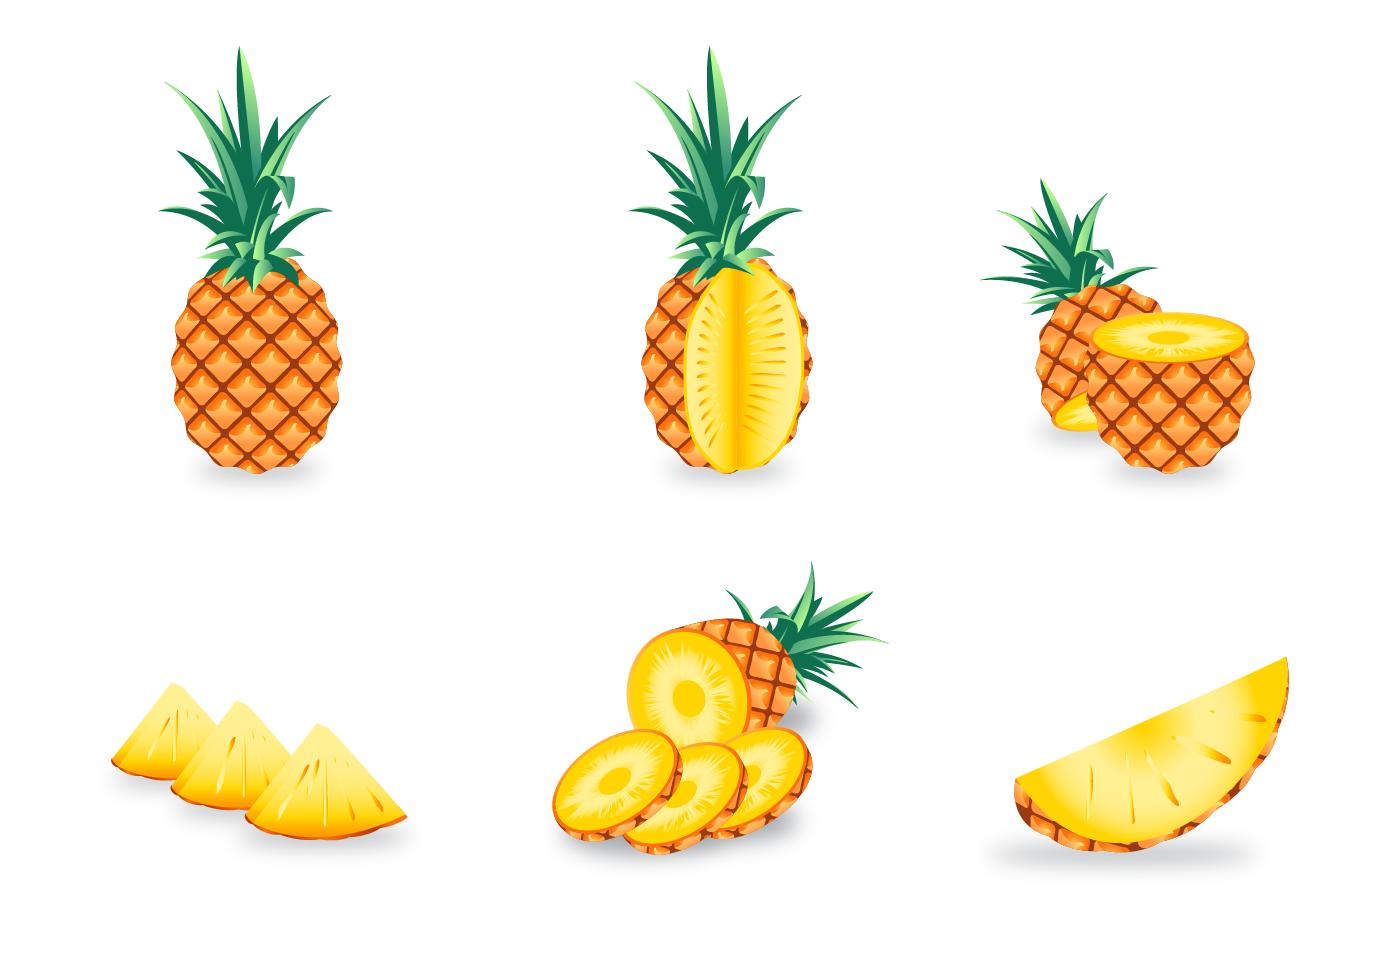 Free Ananas Vector - Download Free Vectors, Clipart ...